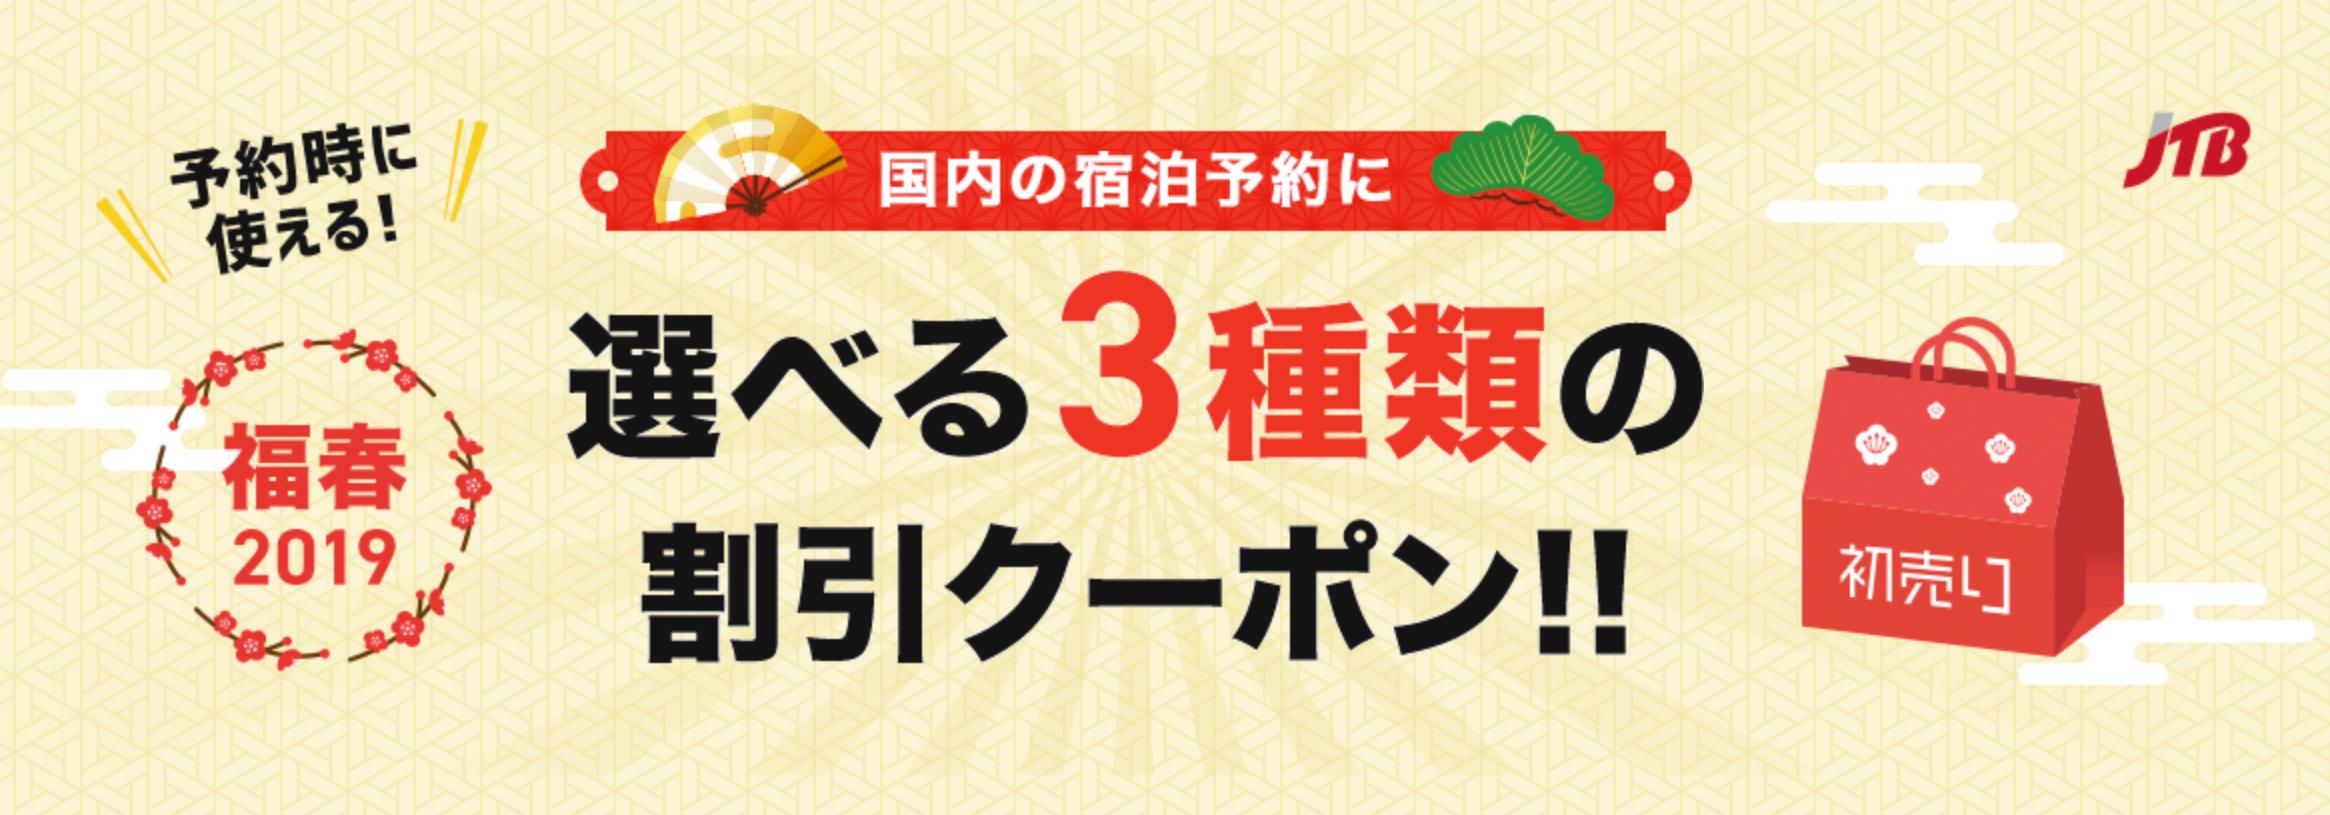 JTBの国内ホテル・宿予約限定!選べる最大5,000円割引クーポン